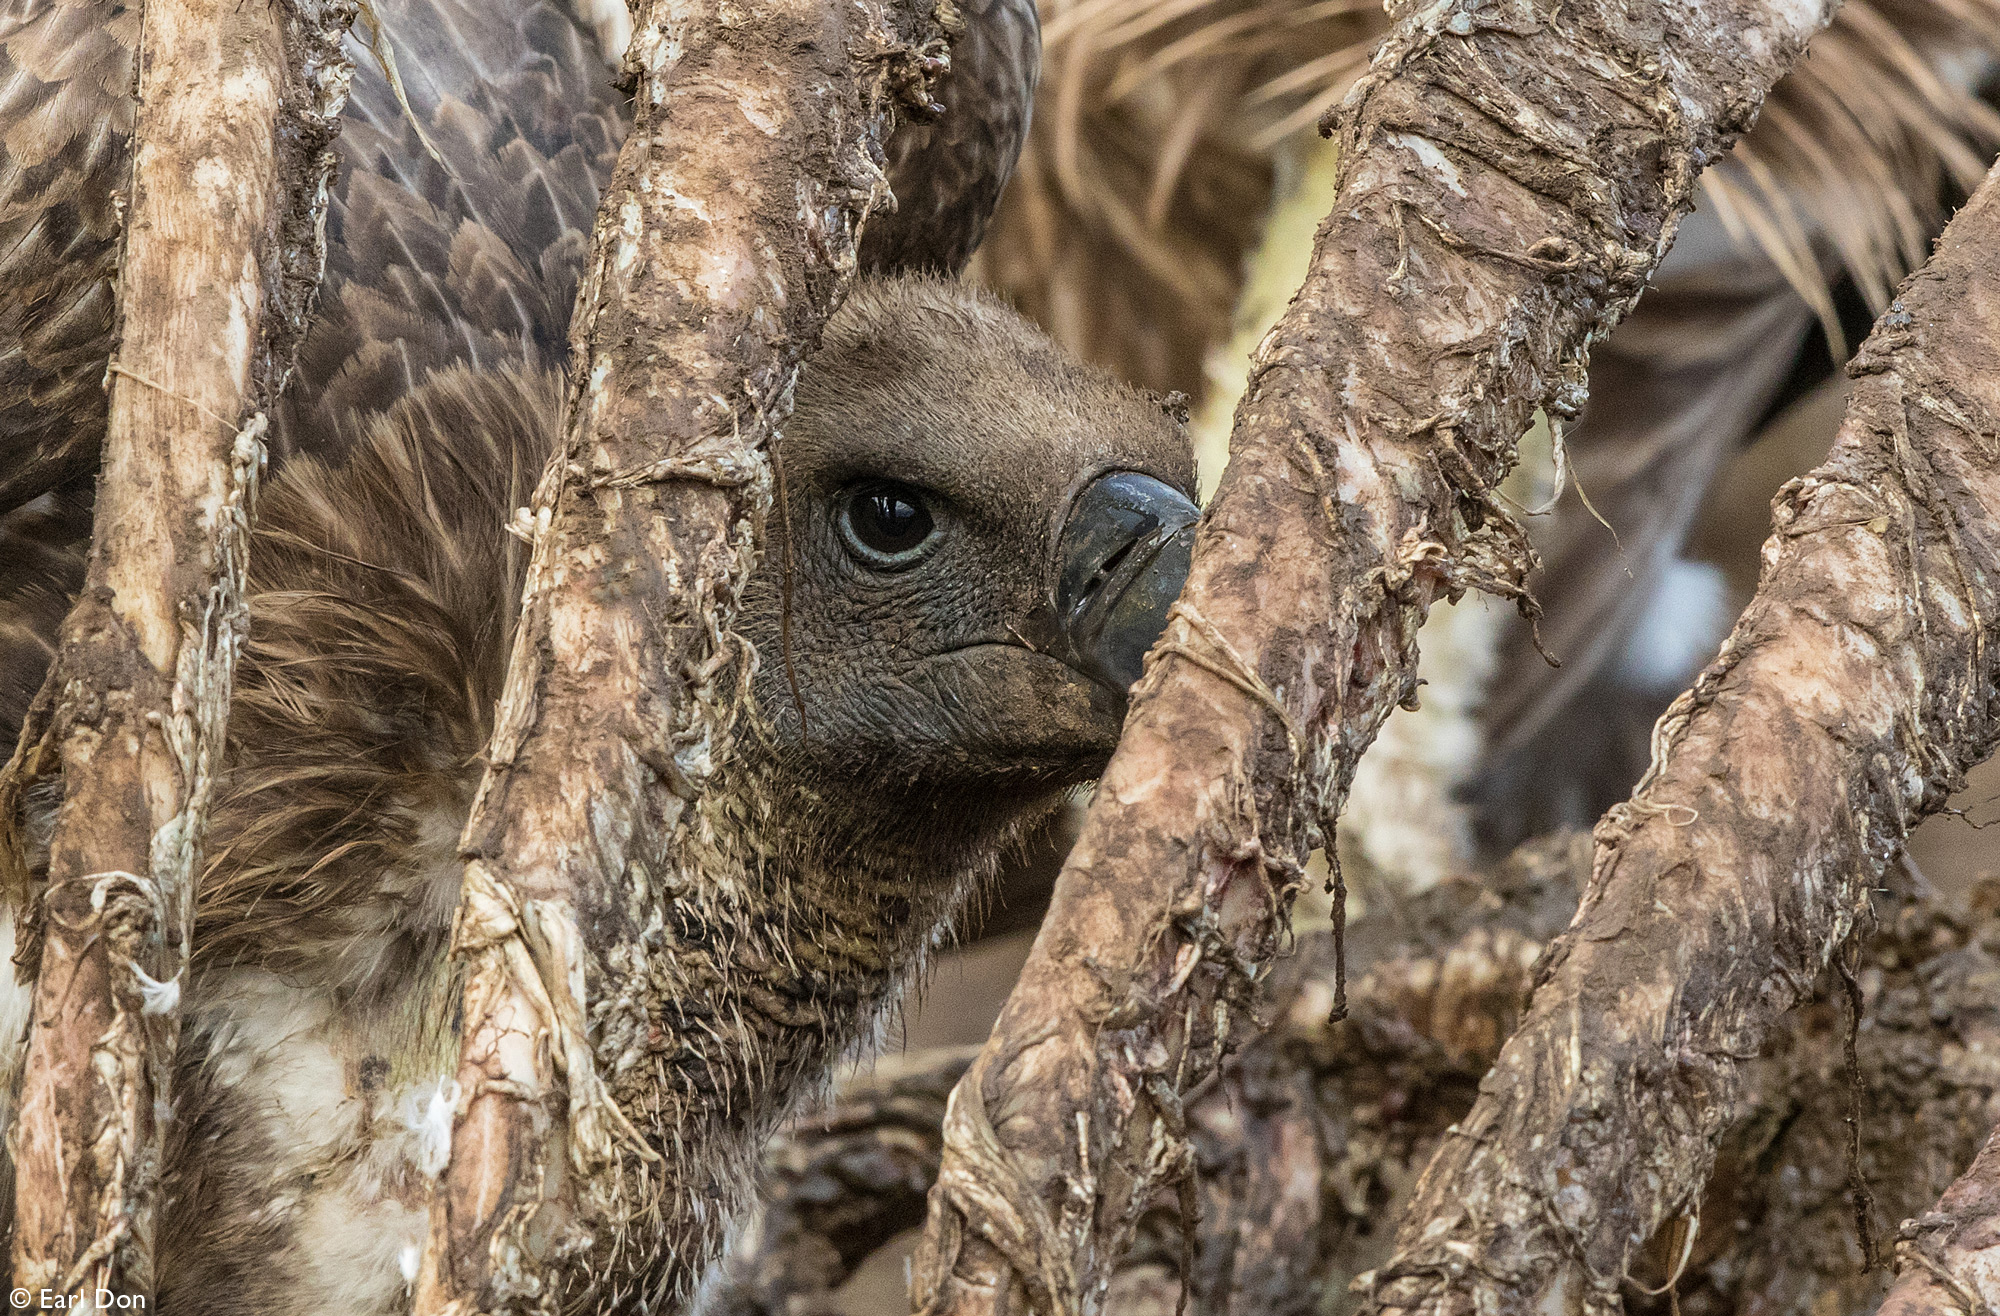 Vulture inside rib cage of carcass in Mashatu Game Reserve in Botswana